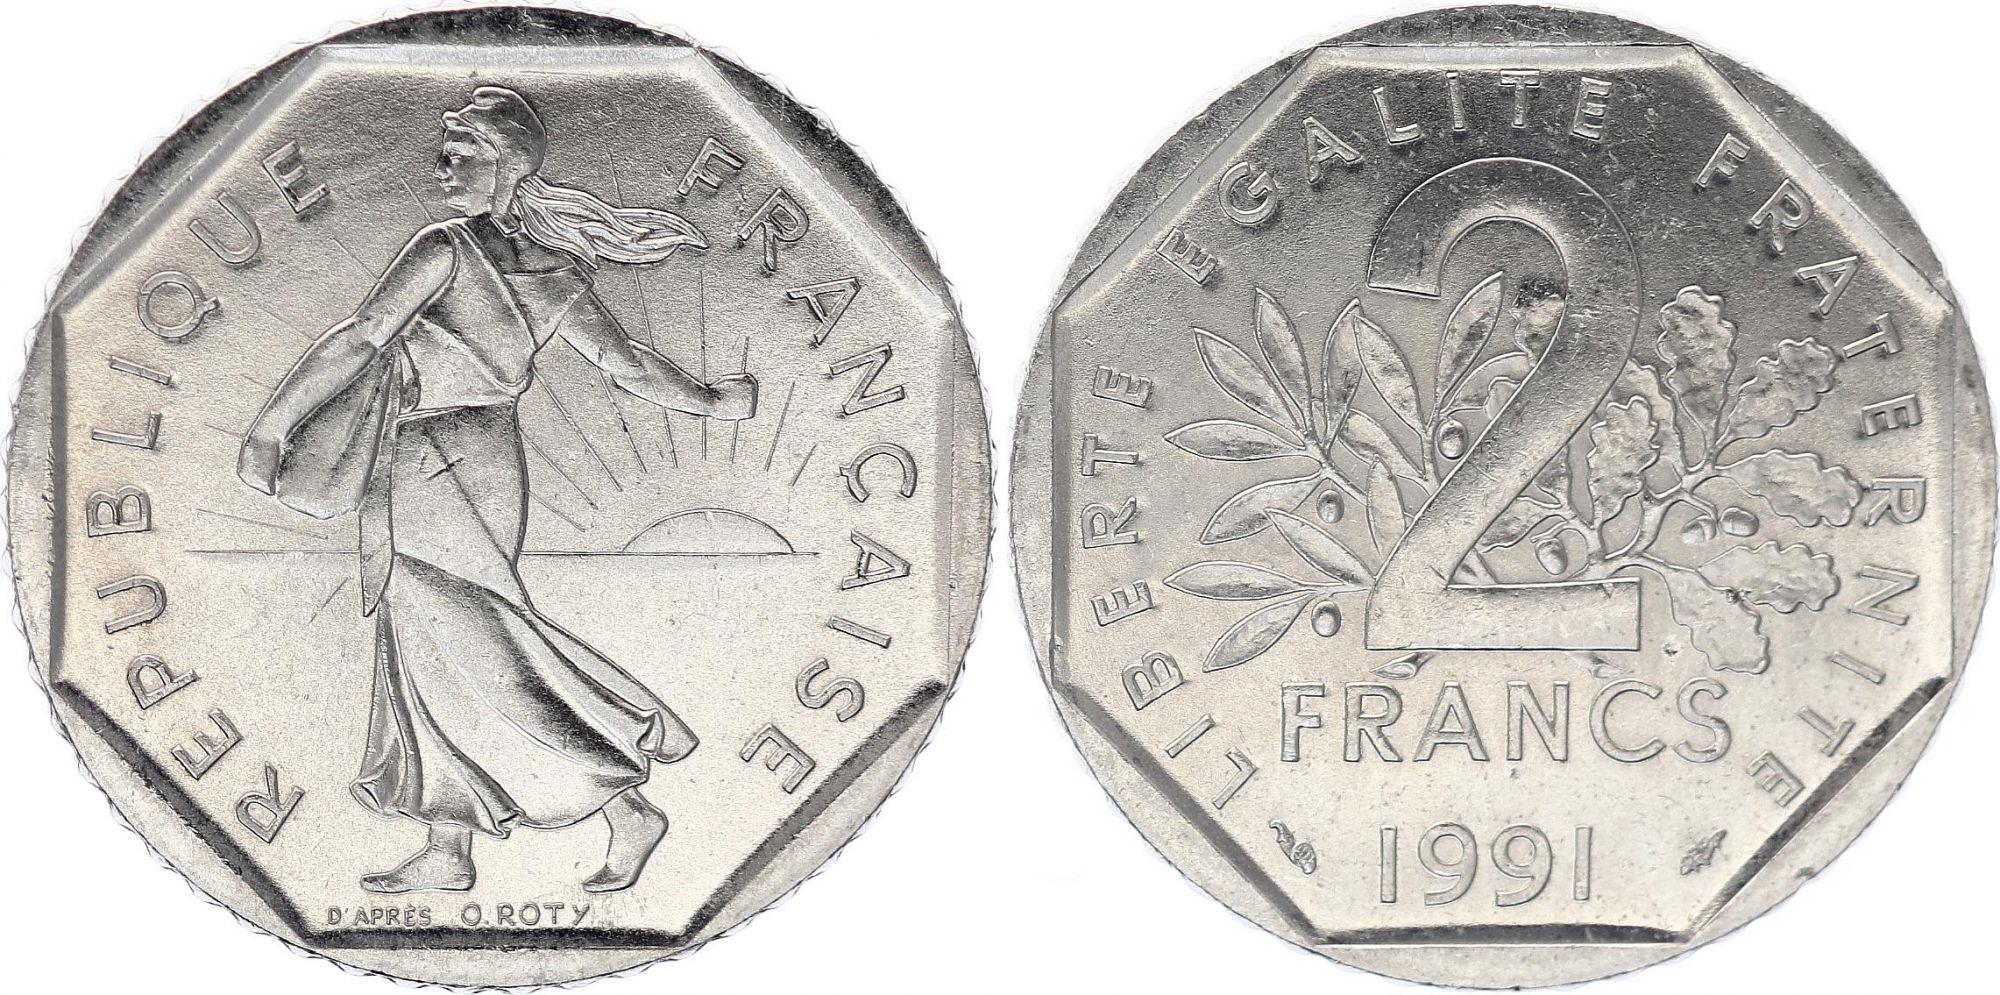 France 2 Francs Semeuse - 1991 frappe monnaie